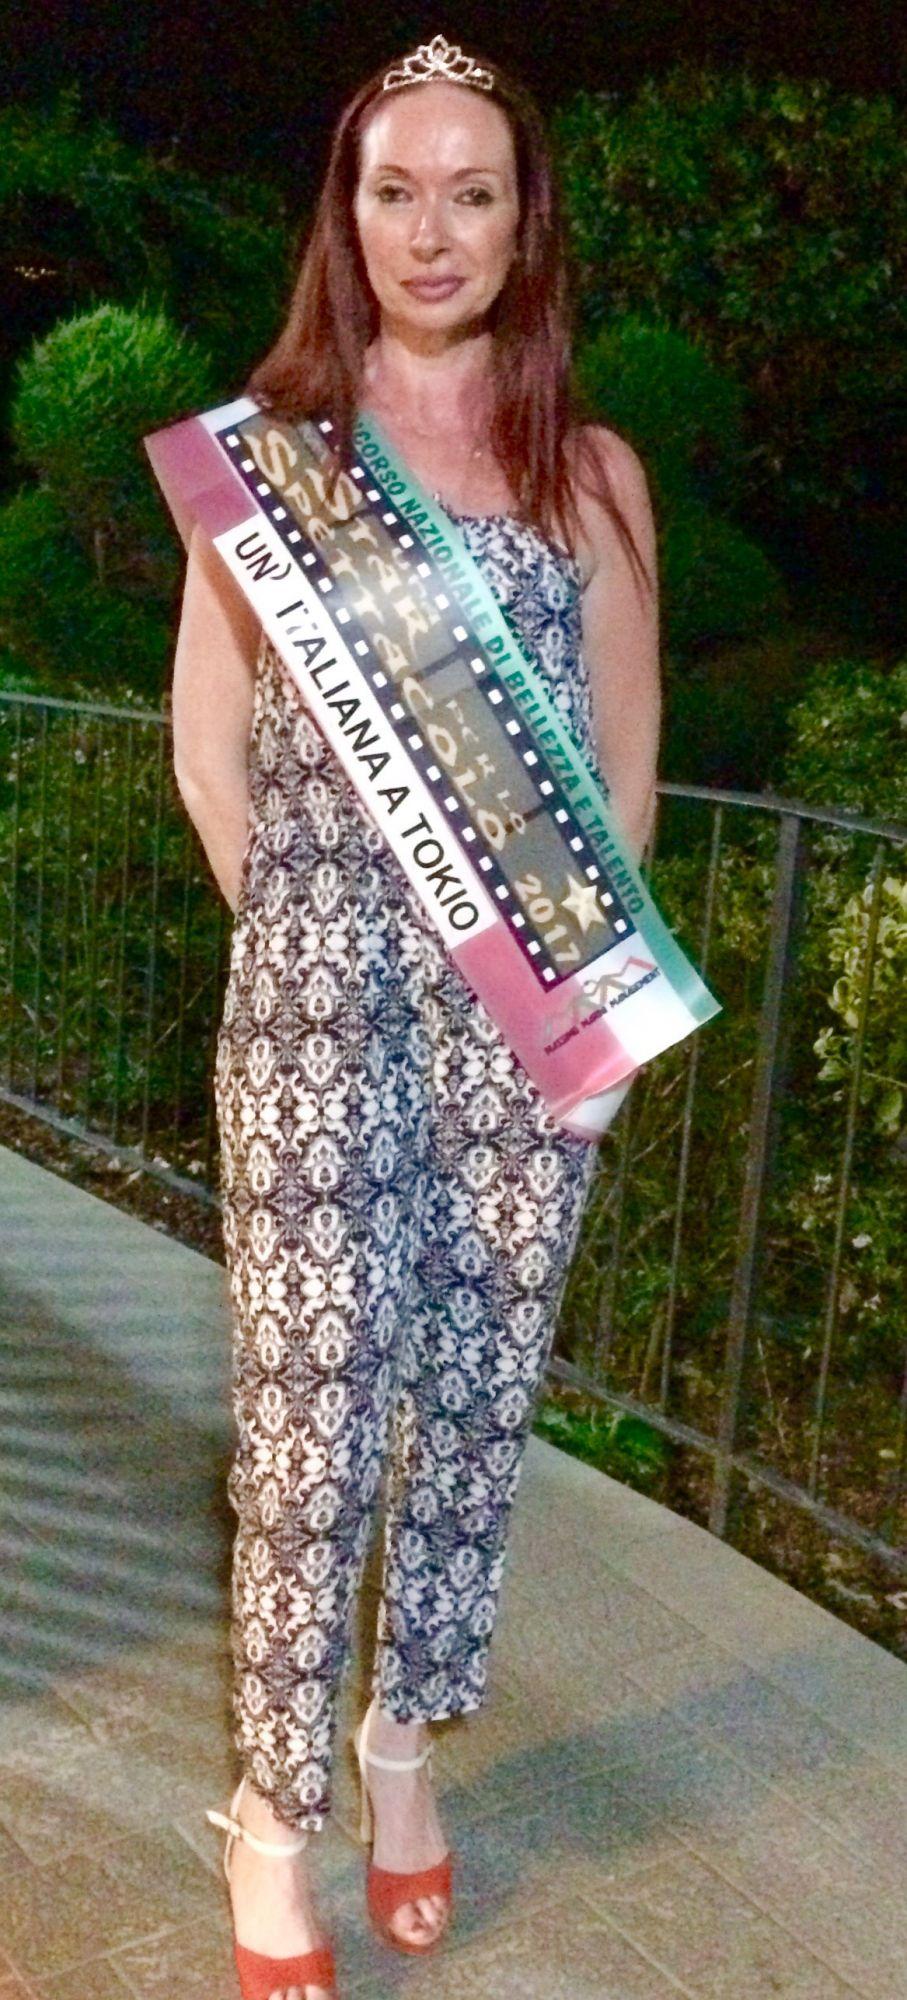 Claudia Fambrini incoronata Miss Italiana a Tokyo